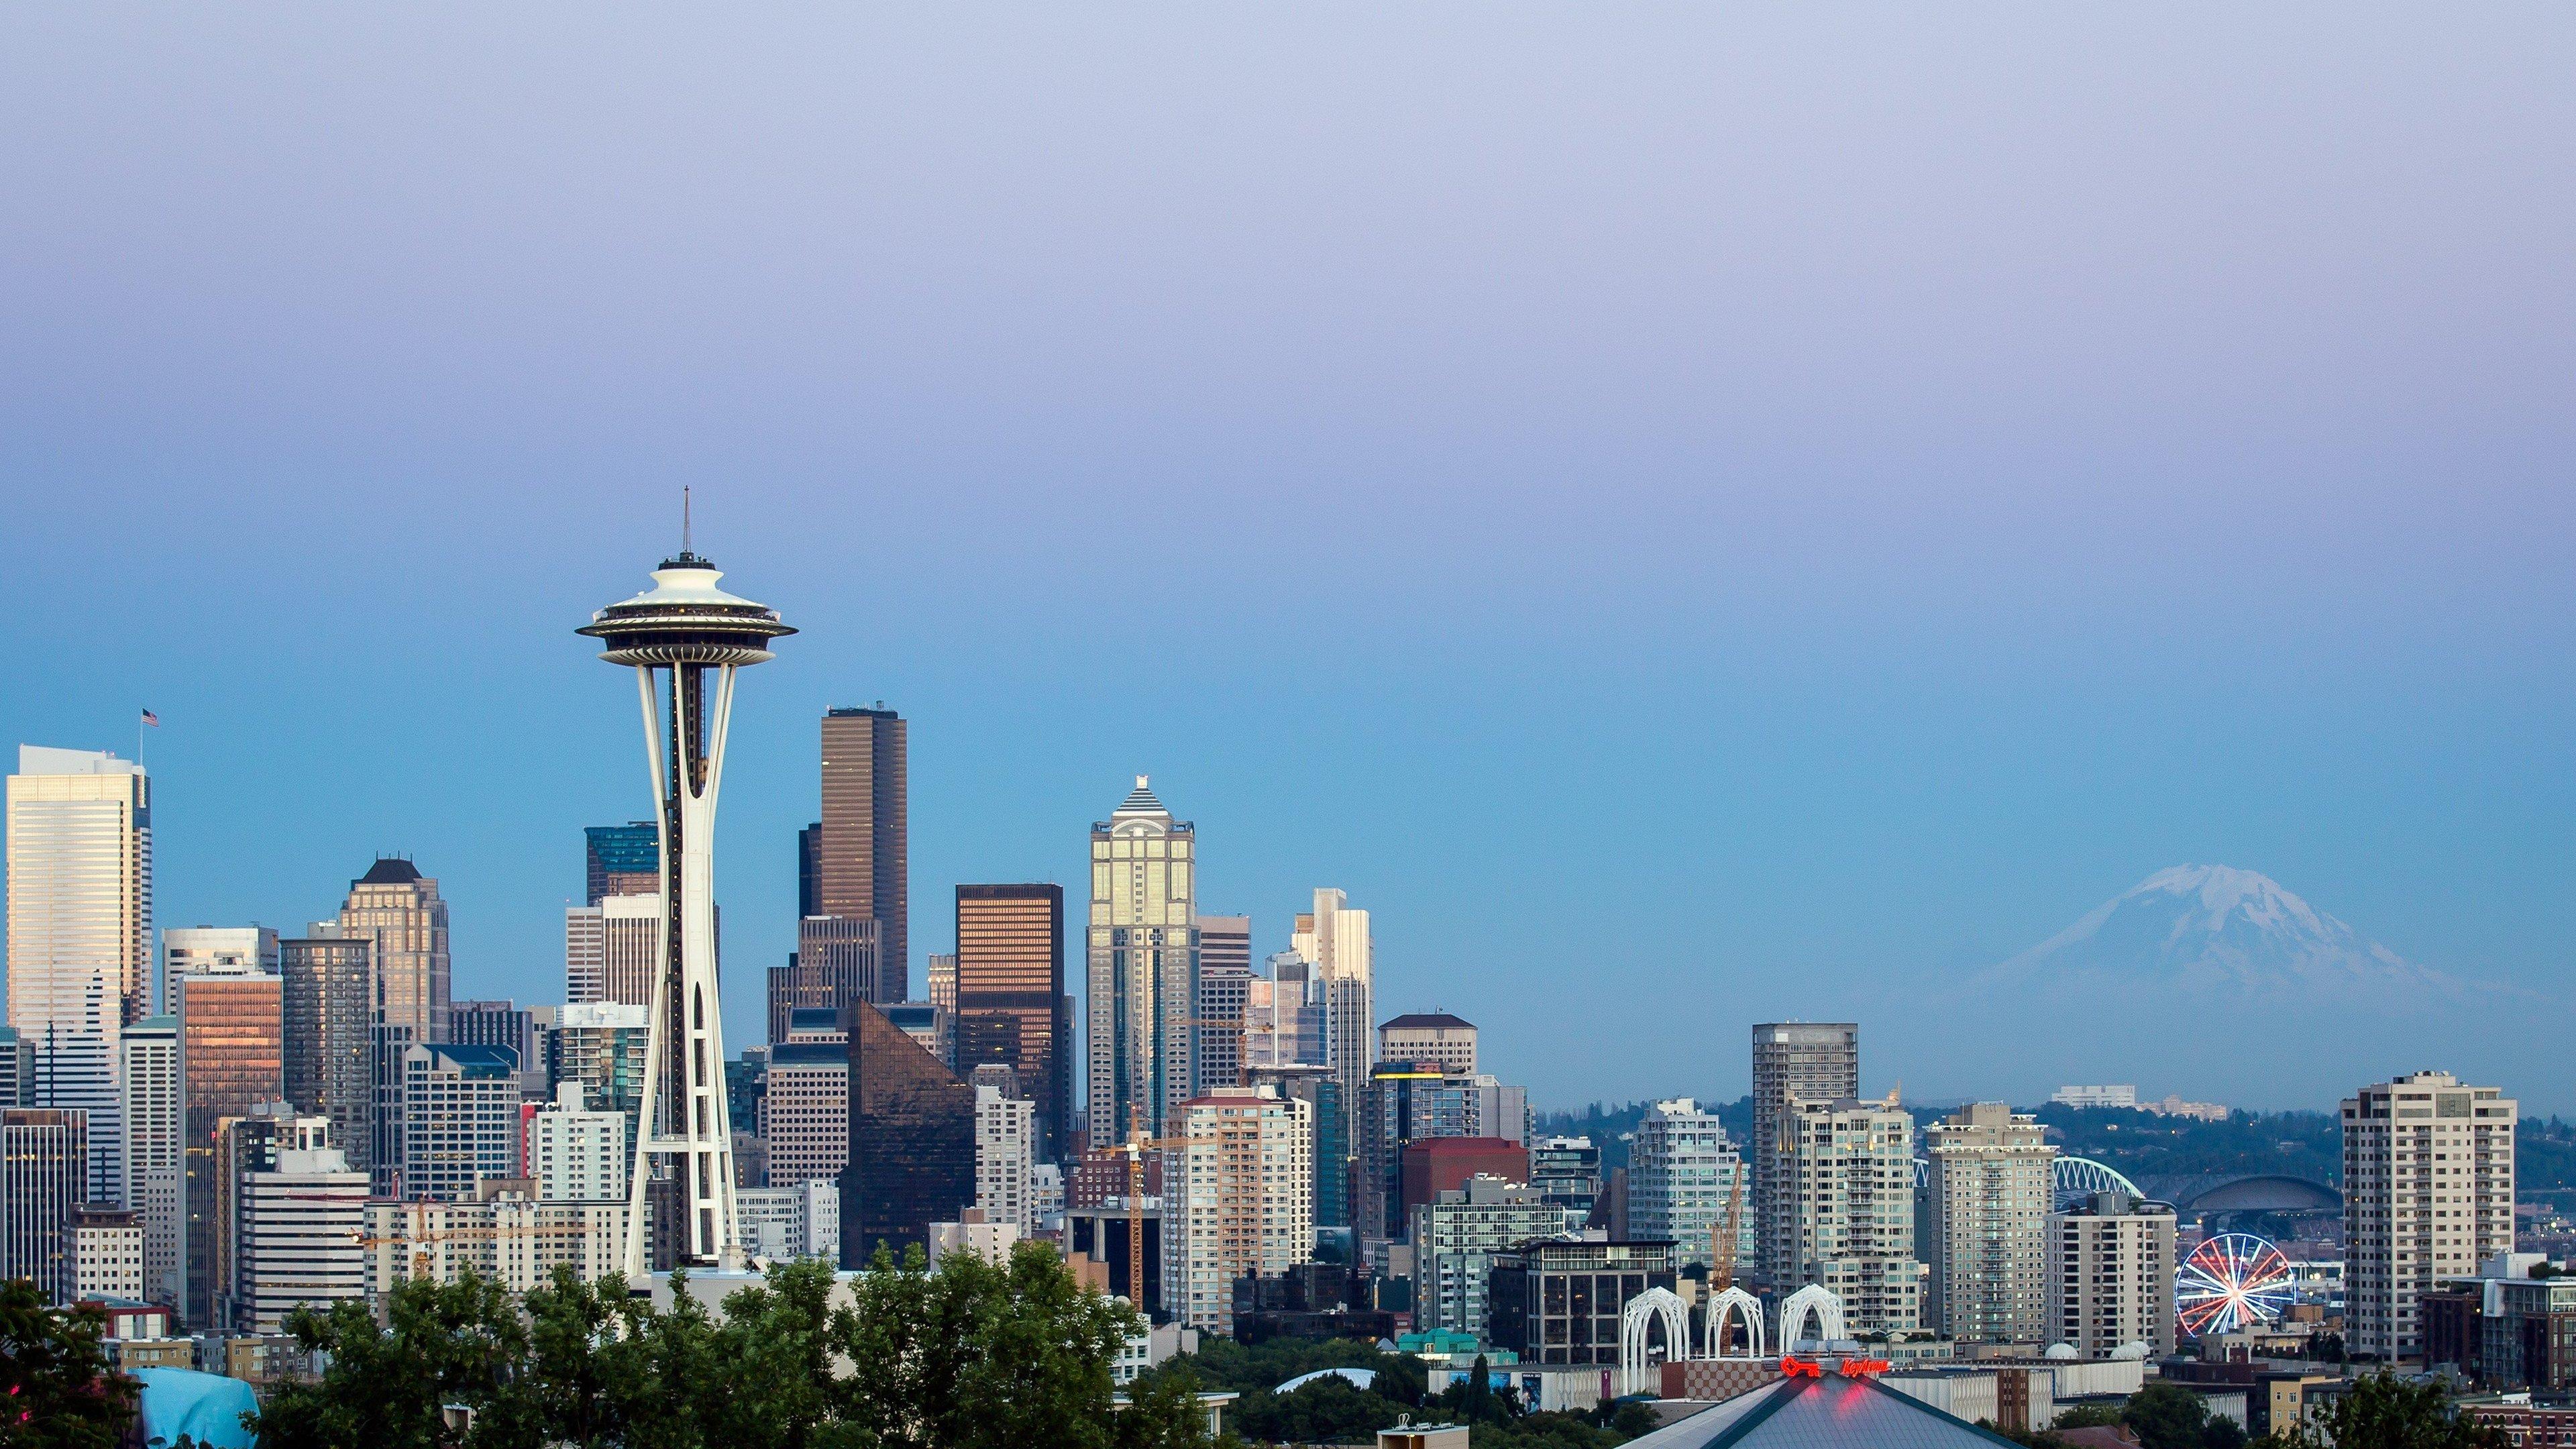 Man Made   Seattle Seattle Wallpaper 3840x2160